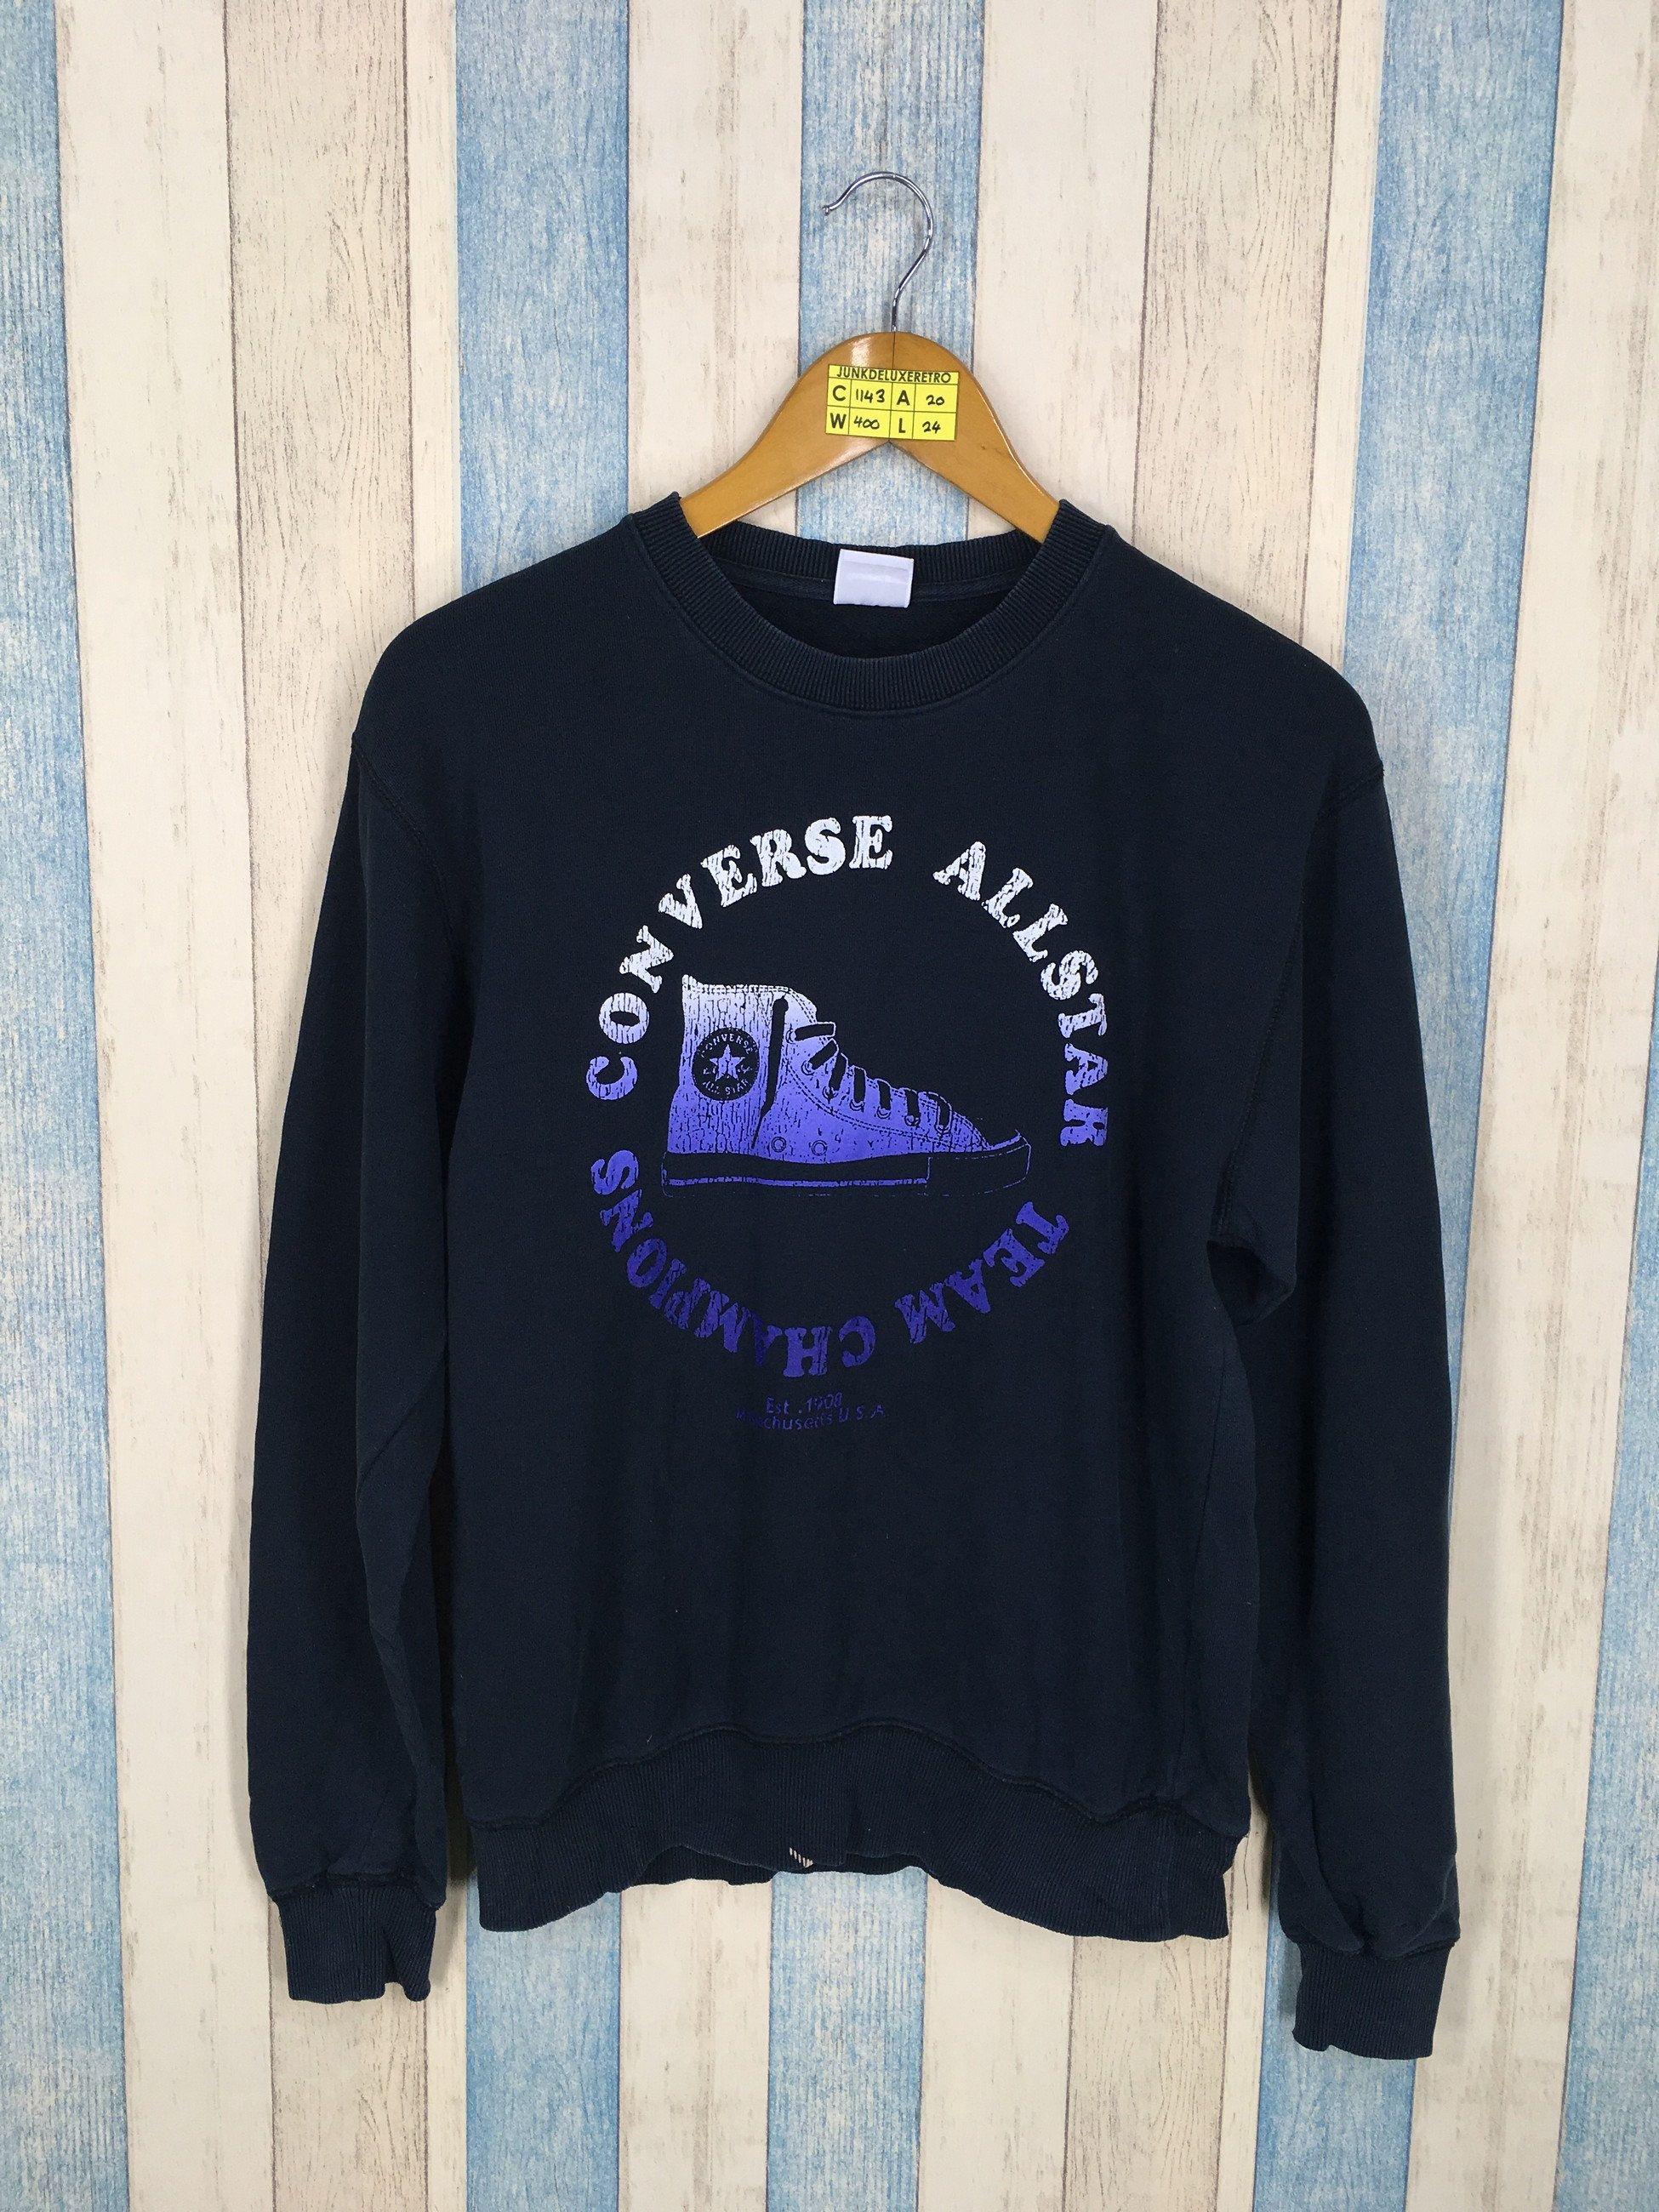 ca4ad44b6a09c CONVERSE All Star Sweatshirt Unisex Medium Vintage 90's Chuck Taylor ...